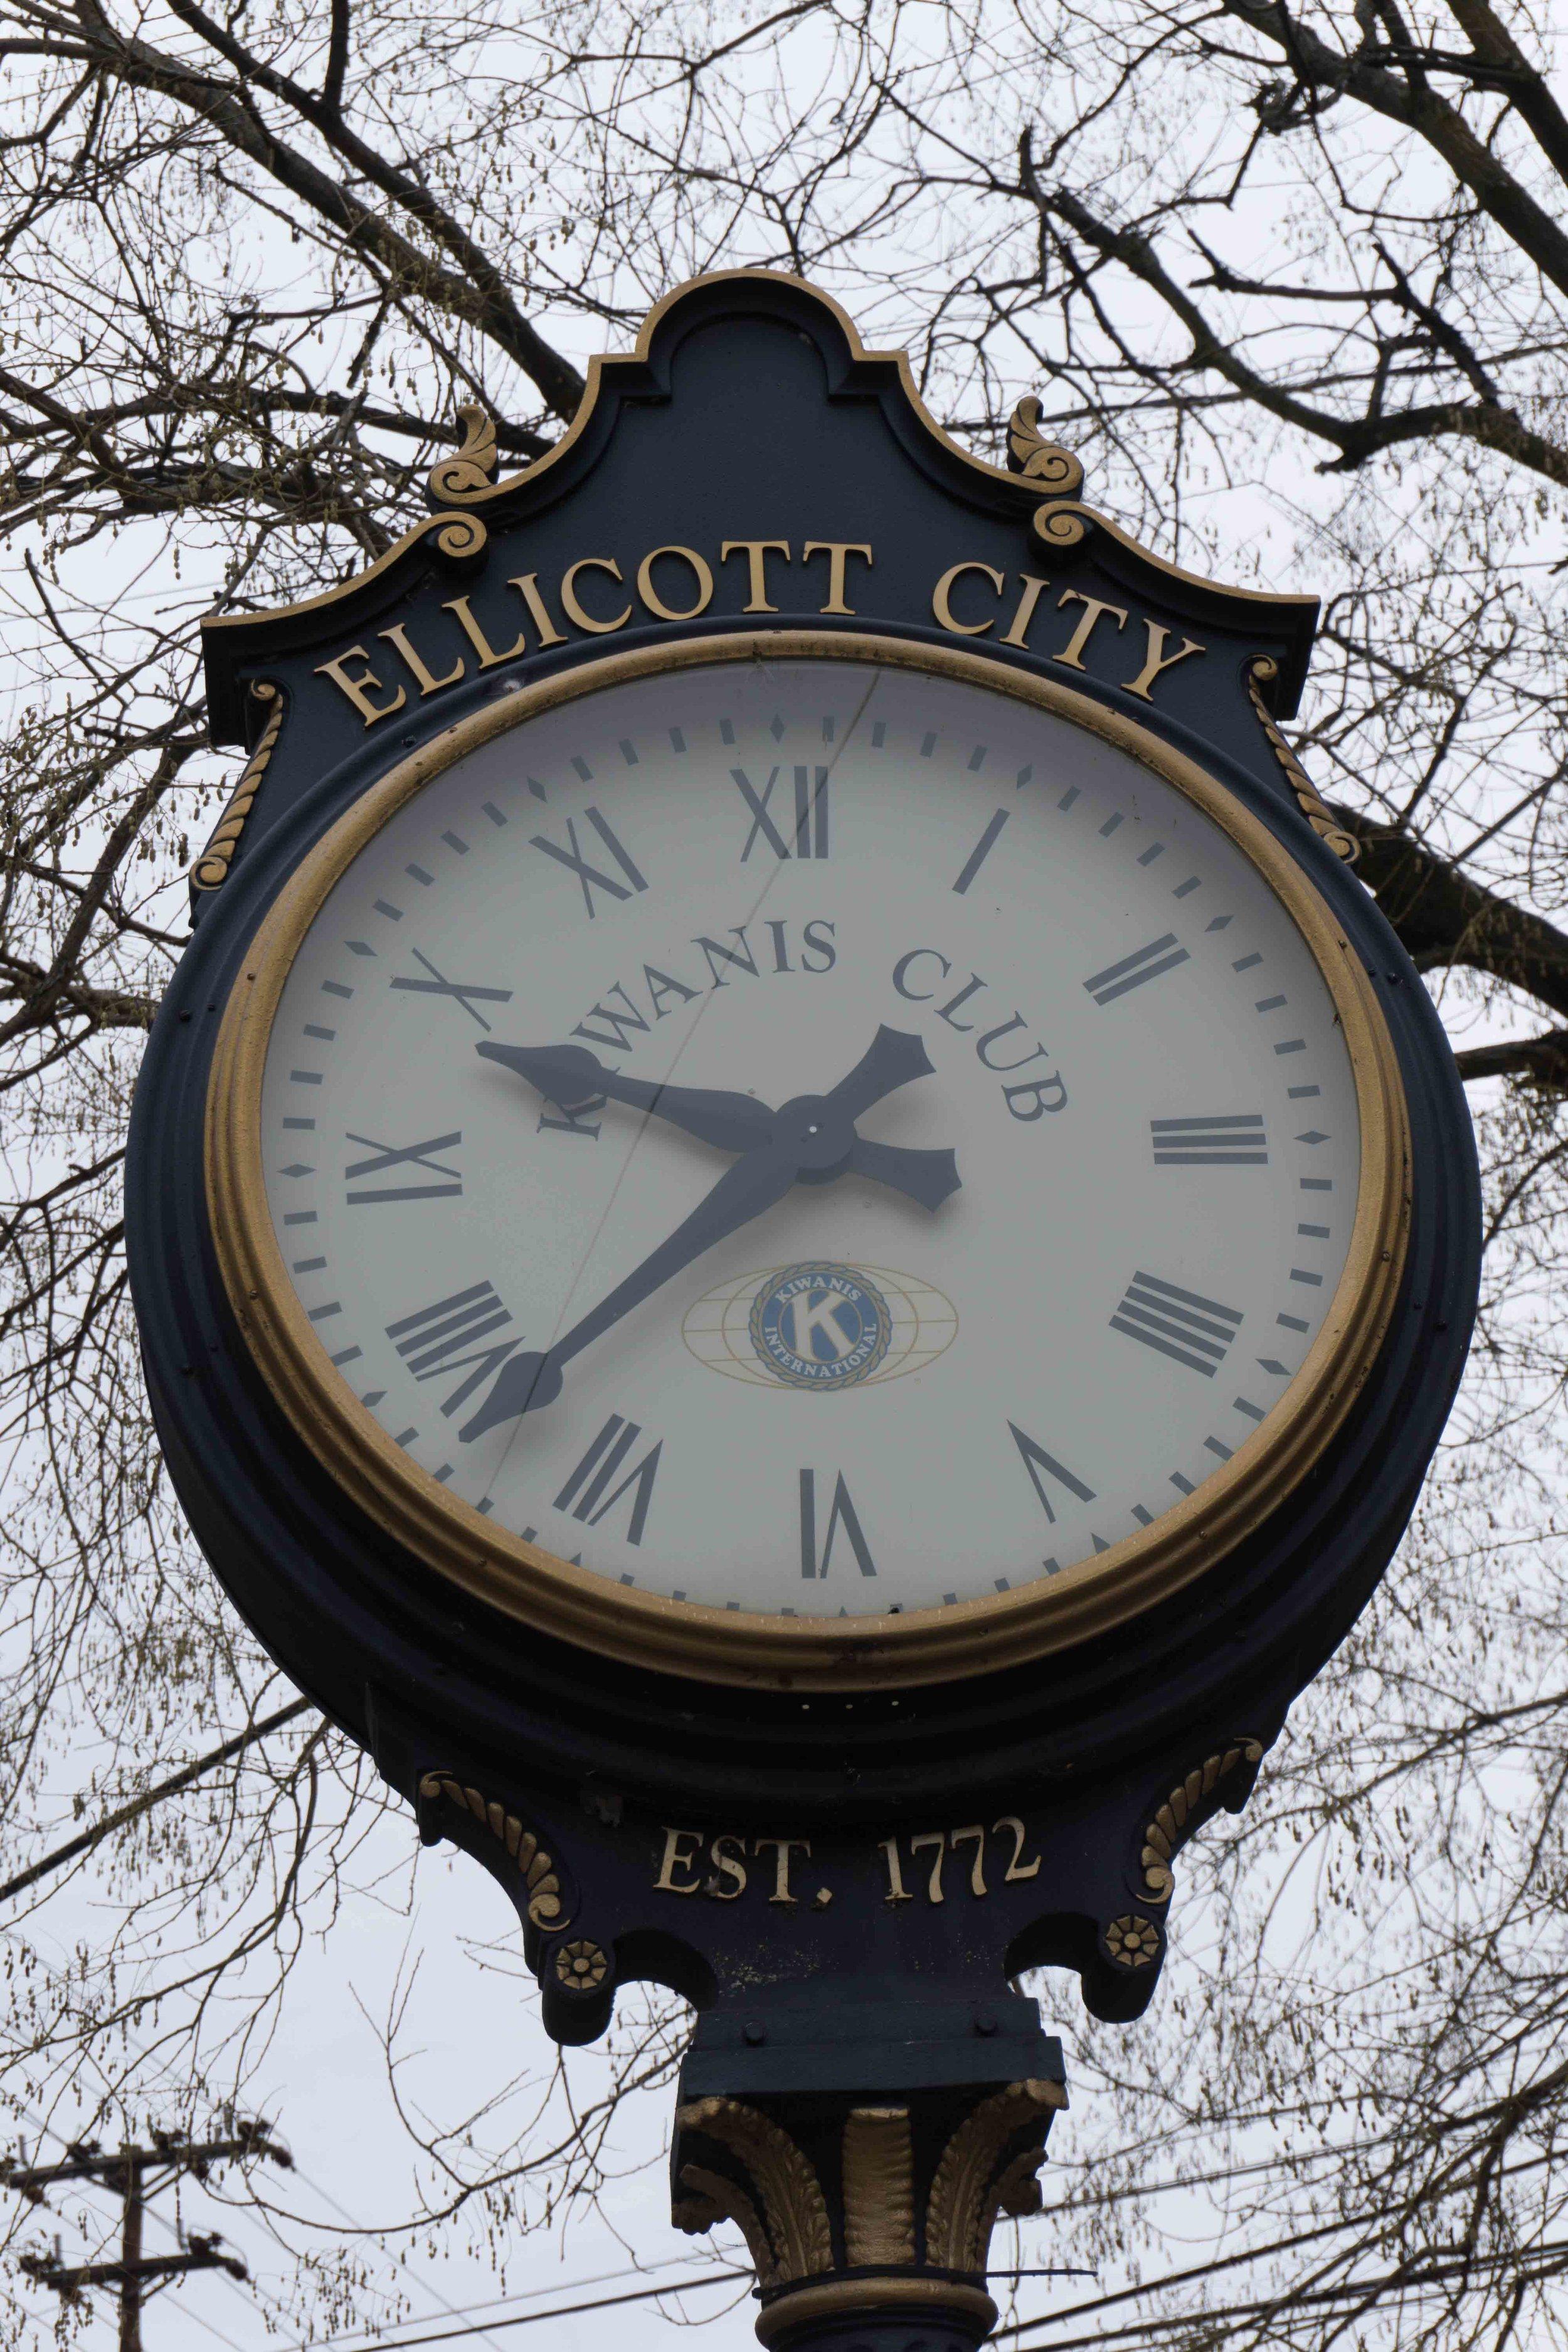 Ellicott City Clock